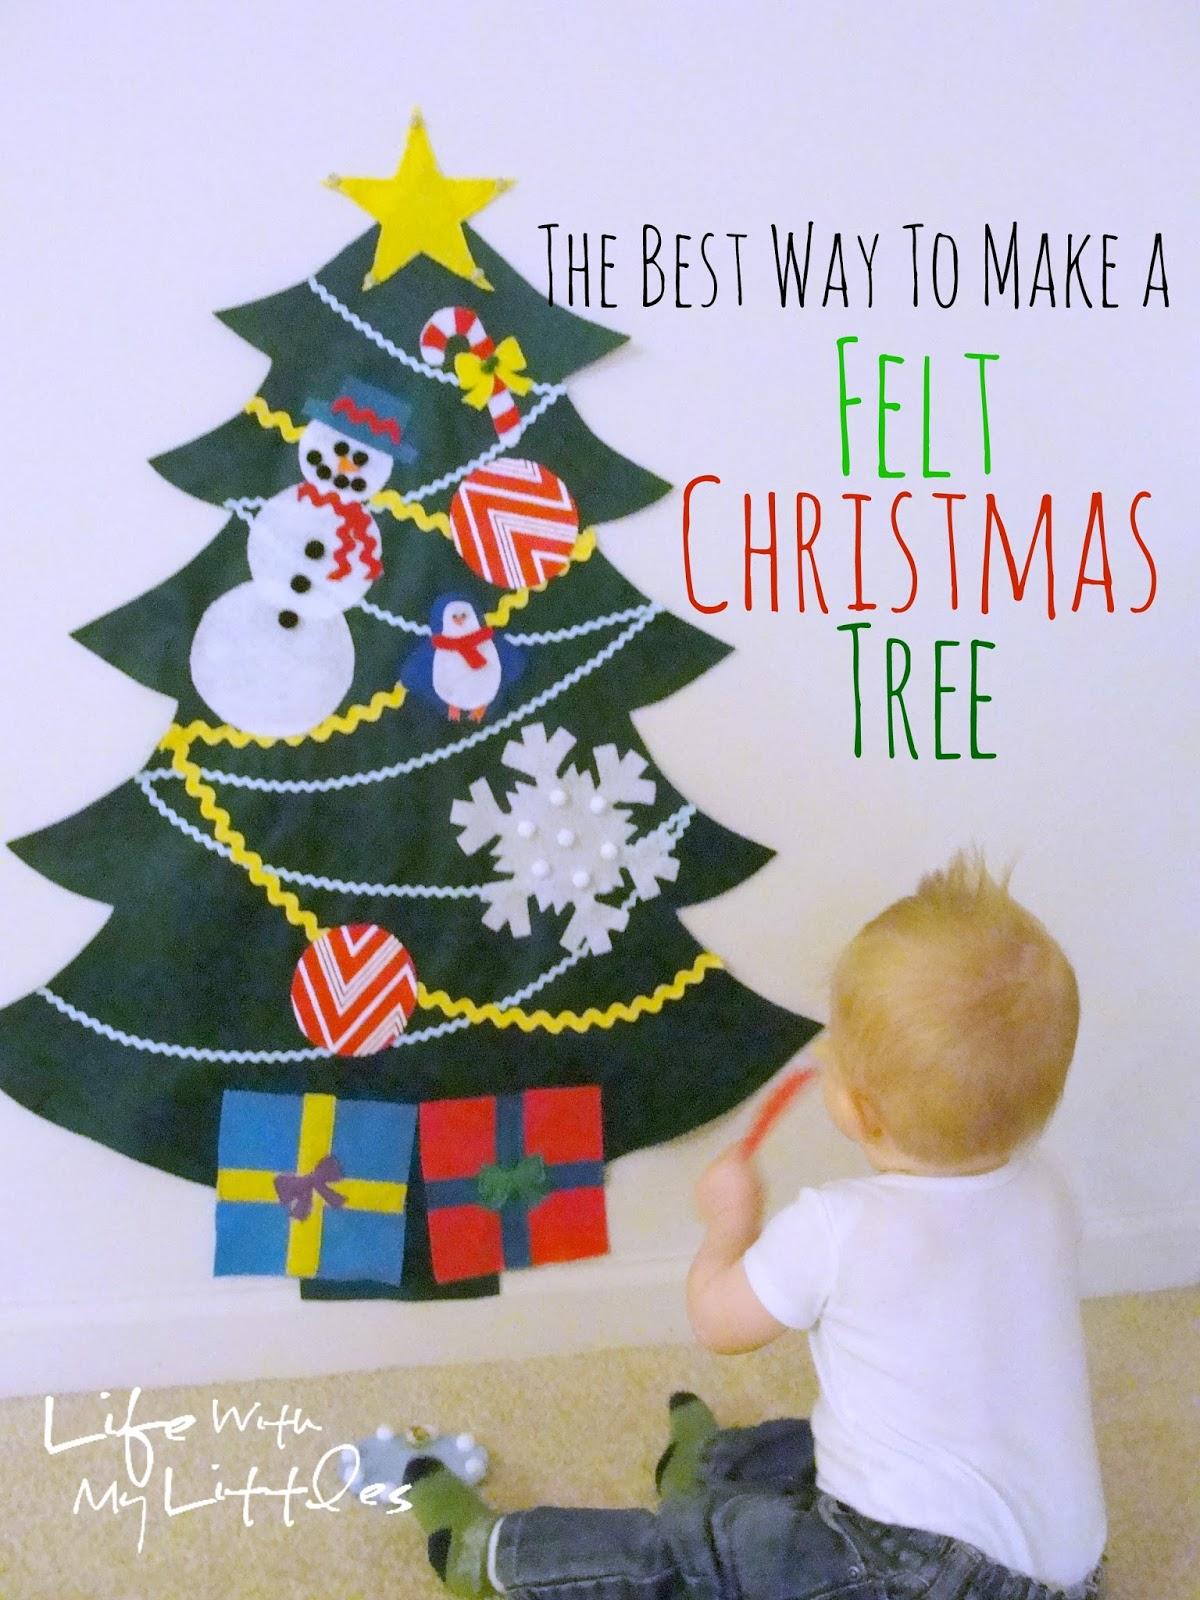 Christmas tree original make your own felt christmas tree decorations